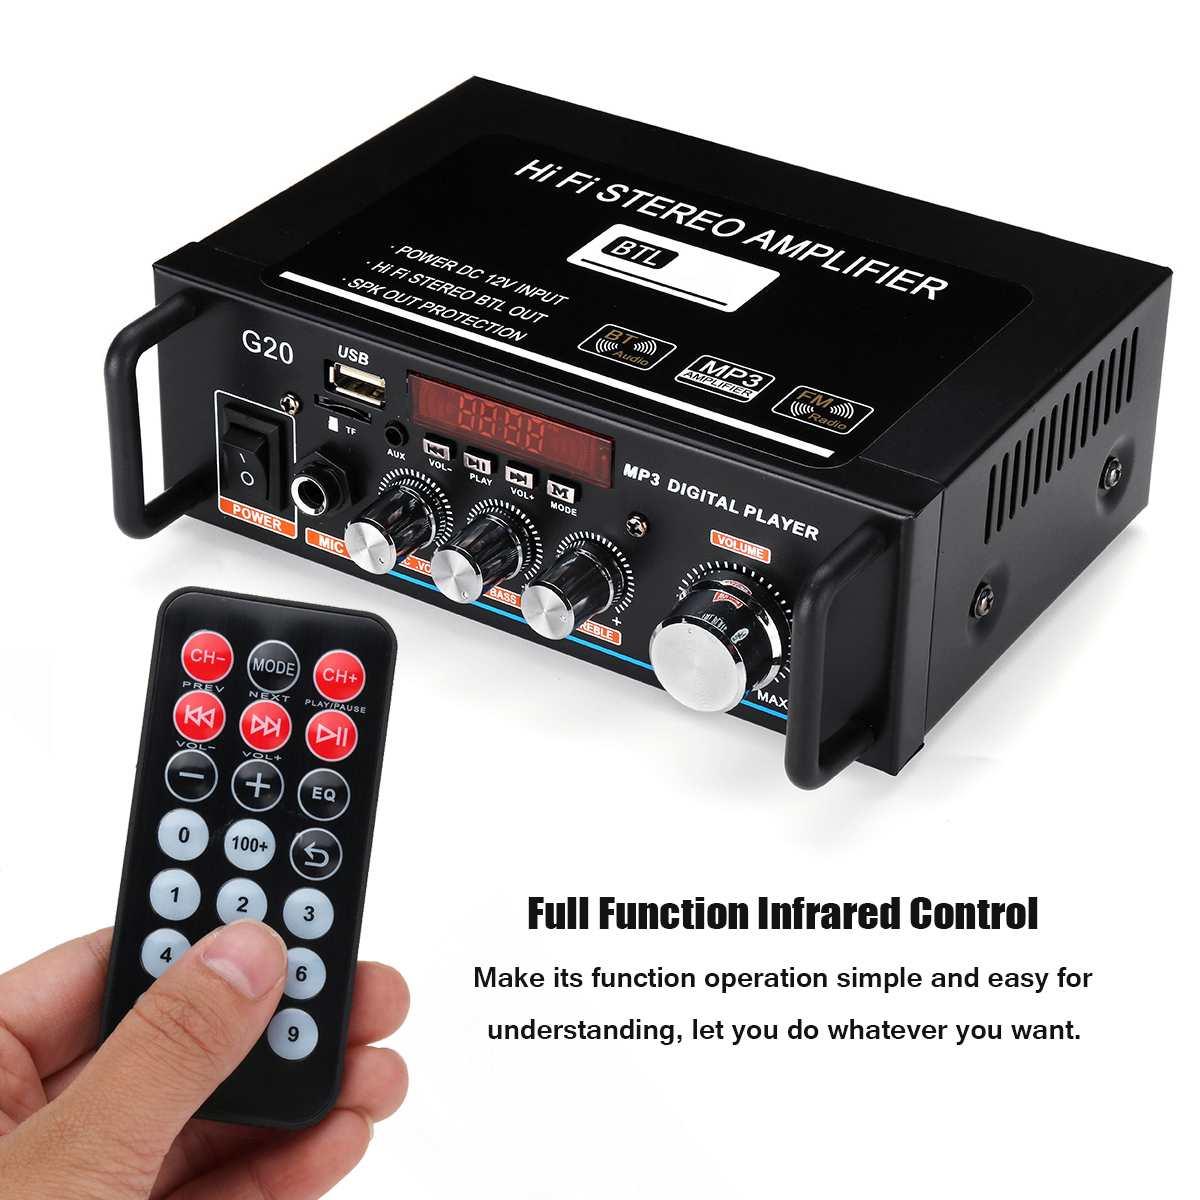 Car Amplifier 600W 220V/12V bluetooth Audio Amplifier Stereo LCD Display HIFI USB FM Radio SD MIC Port with Remote Control